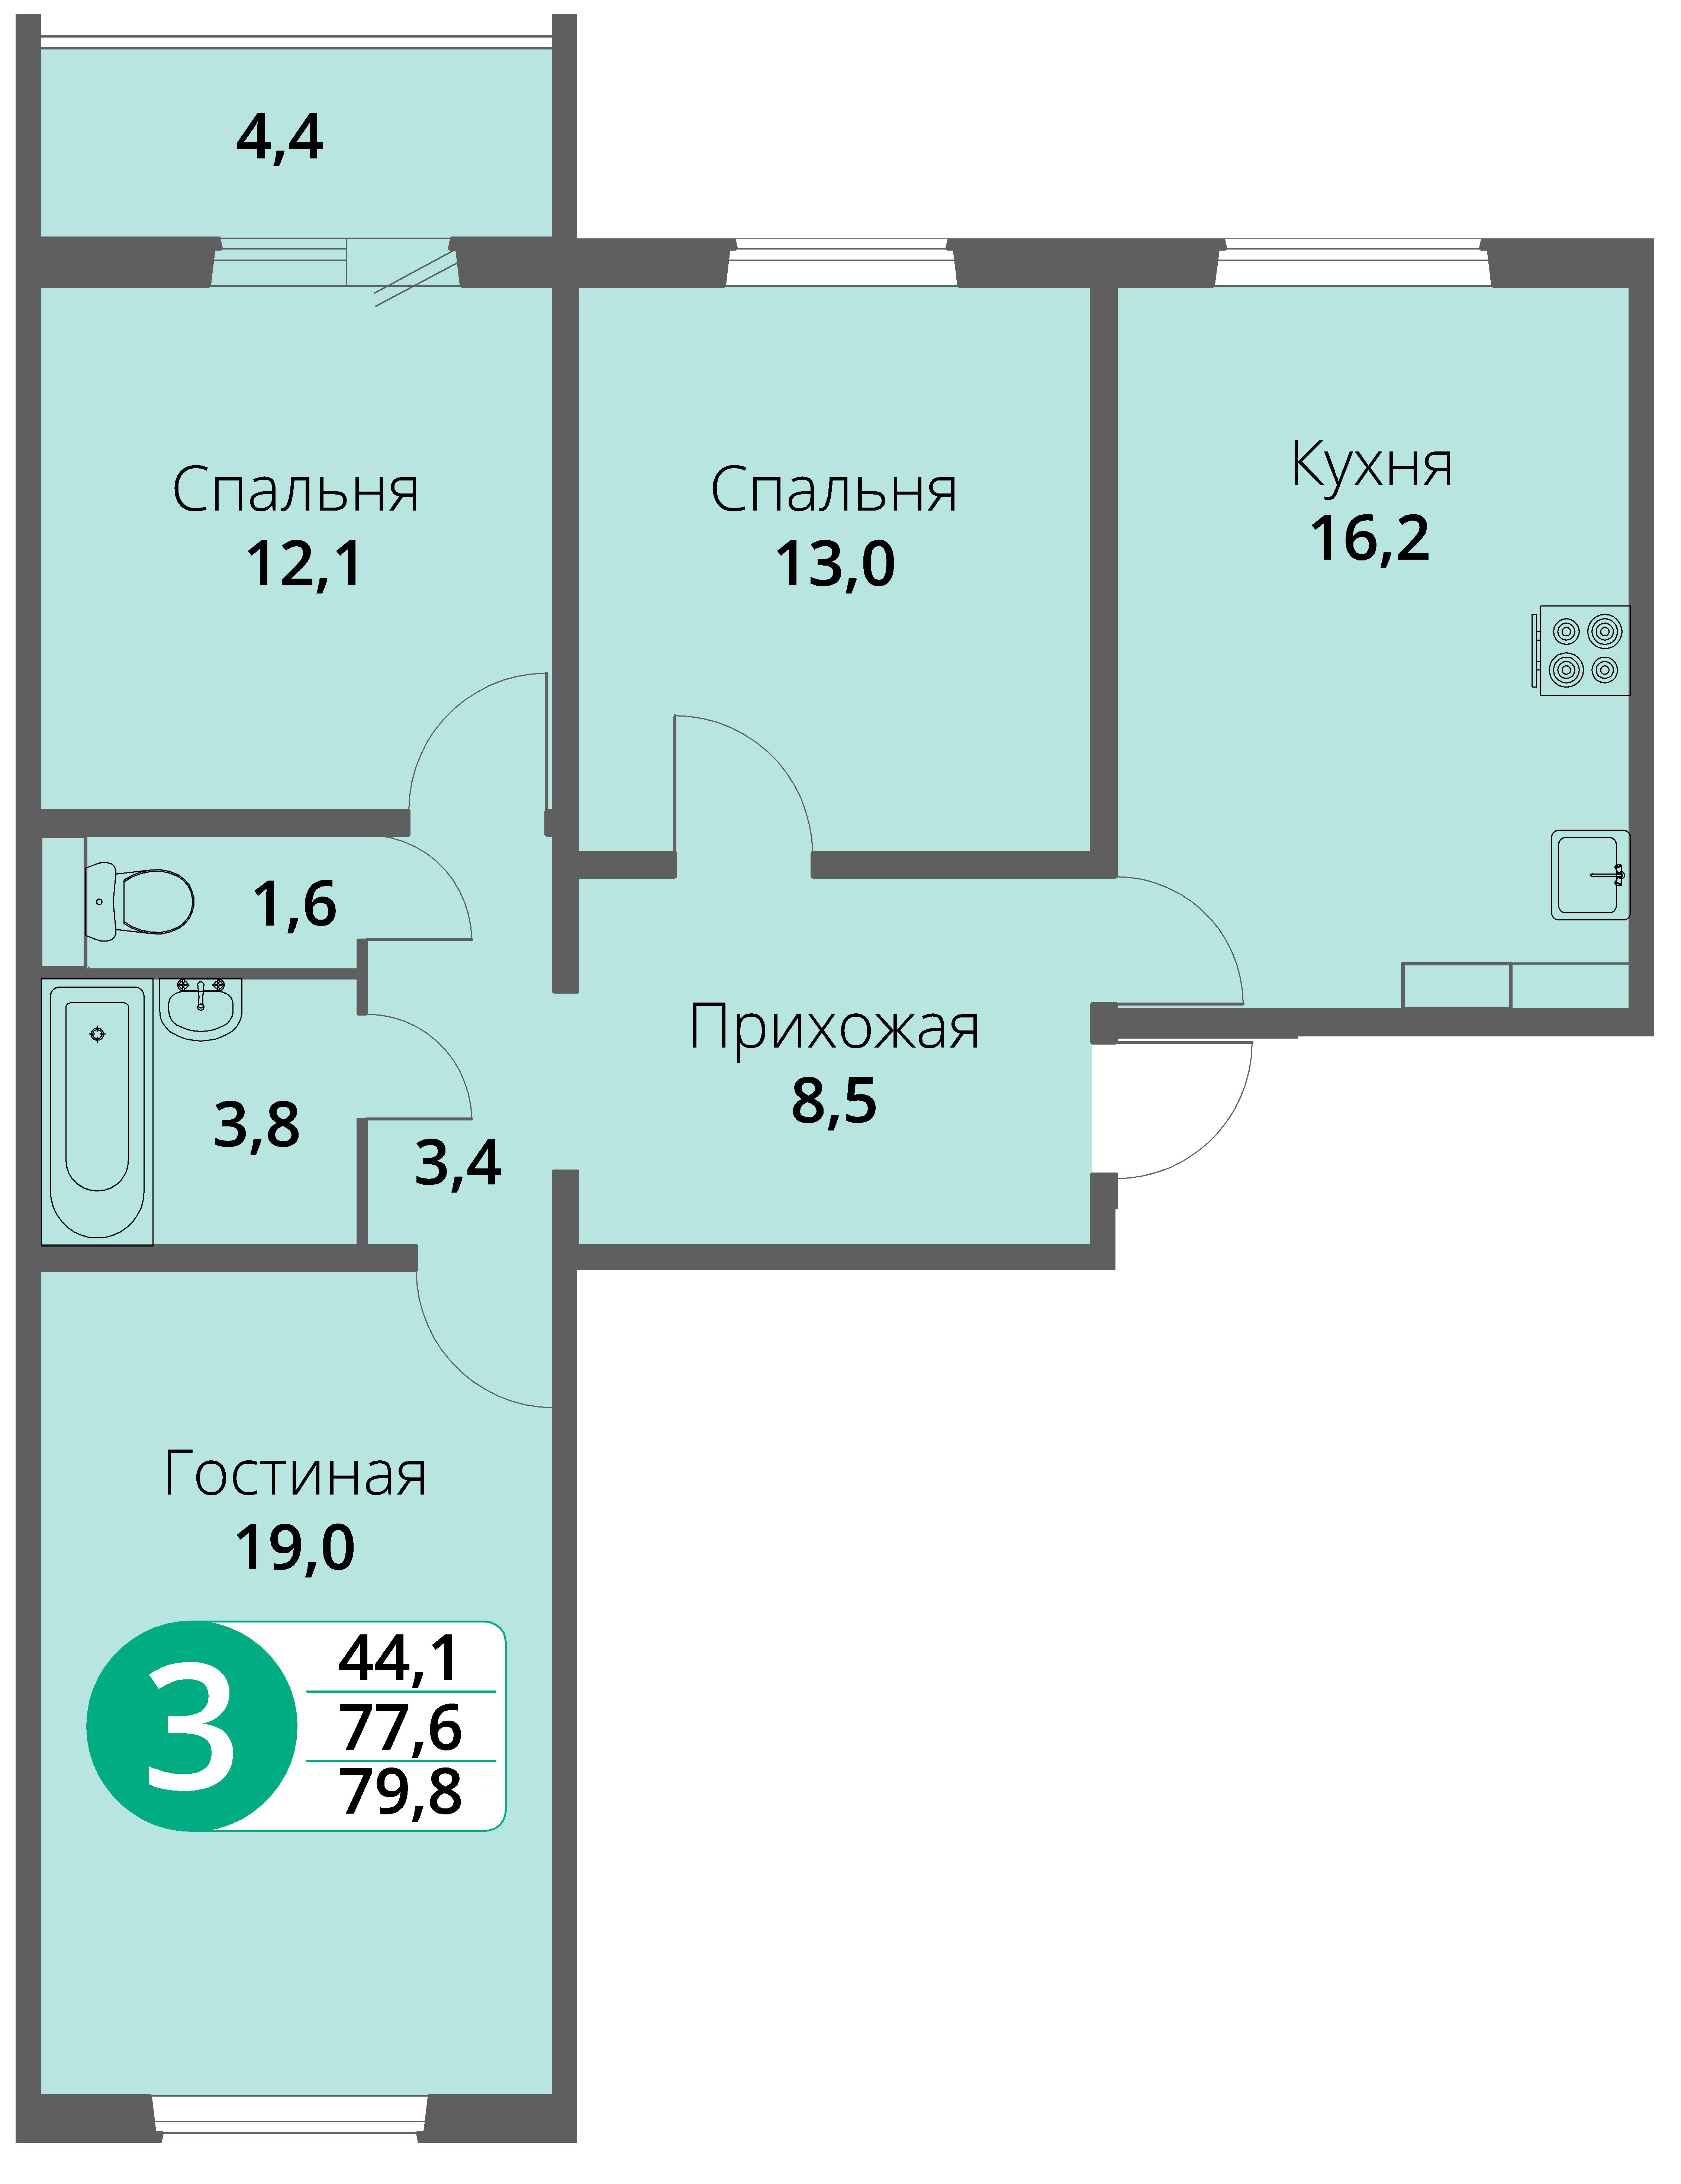 Зареченская 1-1, квартира 5 - Трехкомнатная